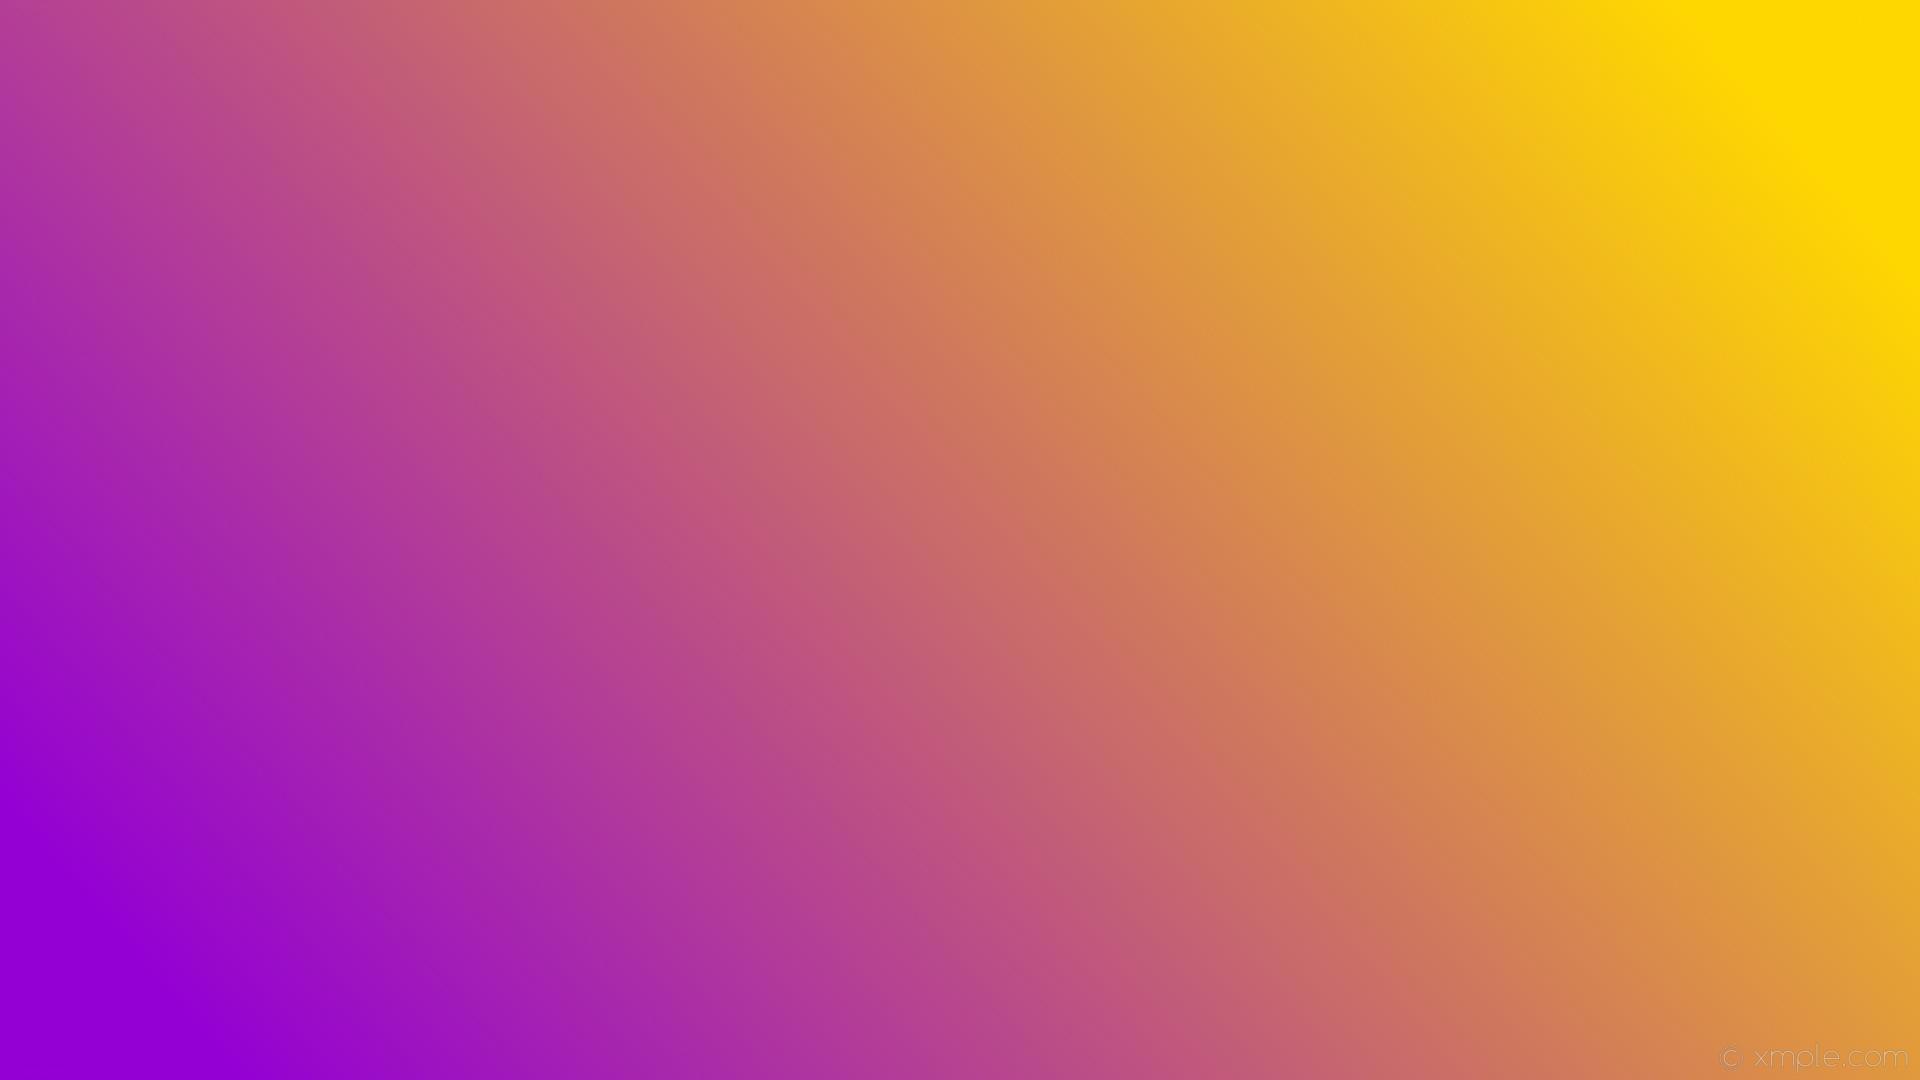 wallpaper linear yellow gradient purple gold dark violet #ffd700 #9400d3 15°